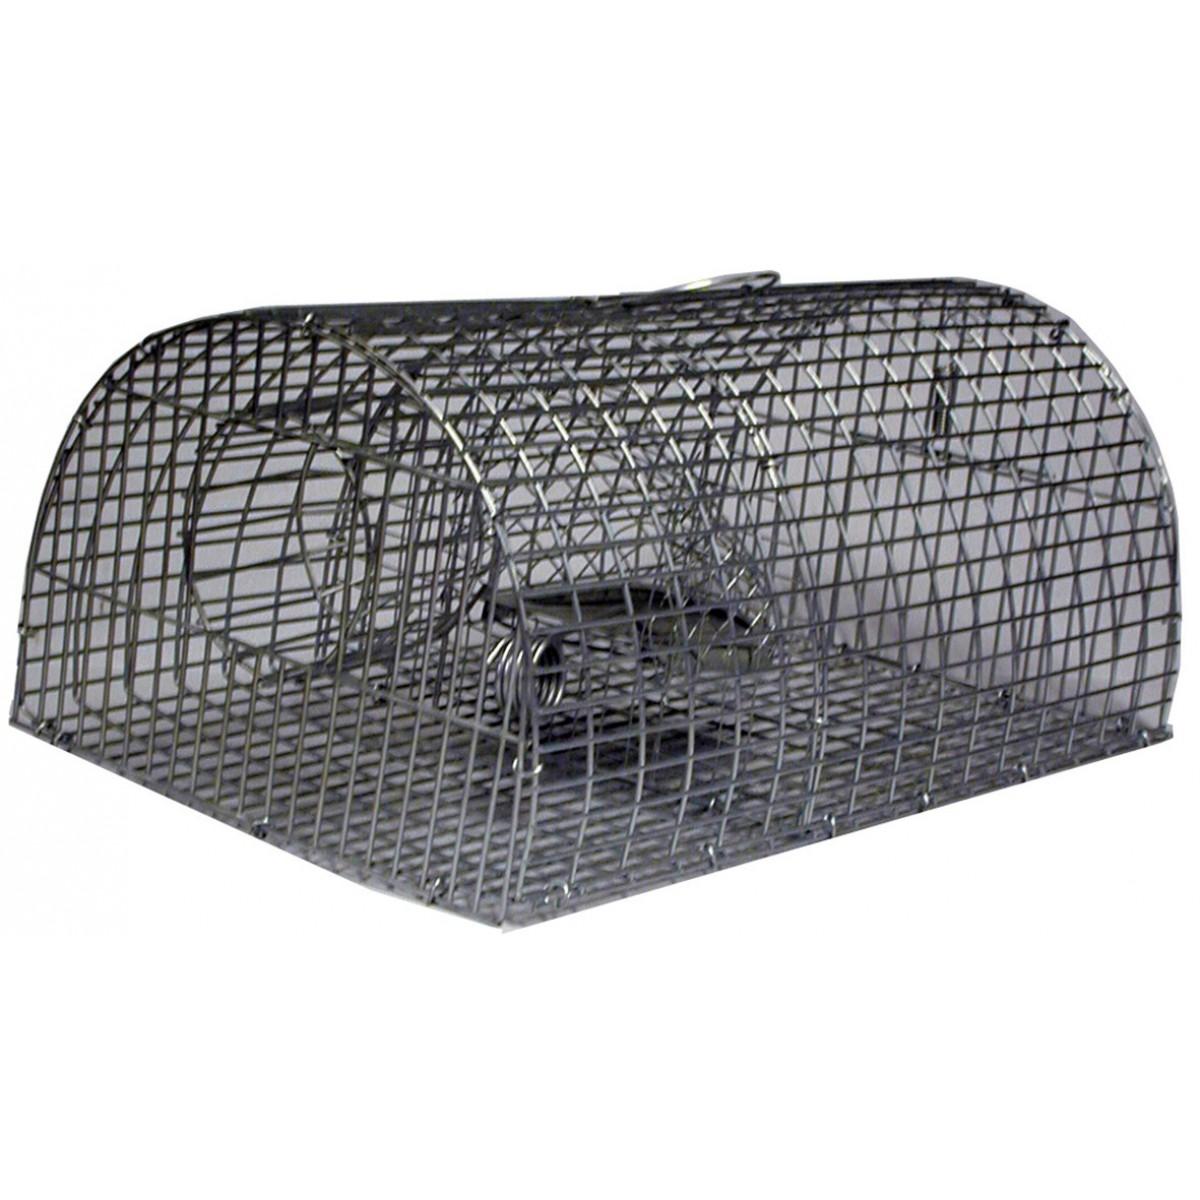 Nasse à rat multiprise forme tunnel Masy - Grillage zingué - Dimensions 45 x 29 x 21 cm - Maille 25 x 12 mm |